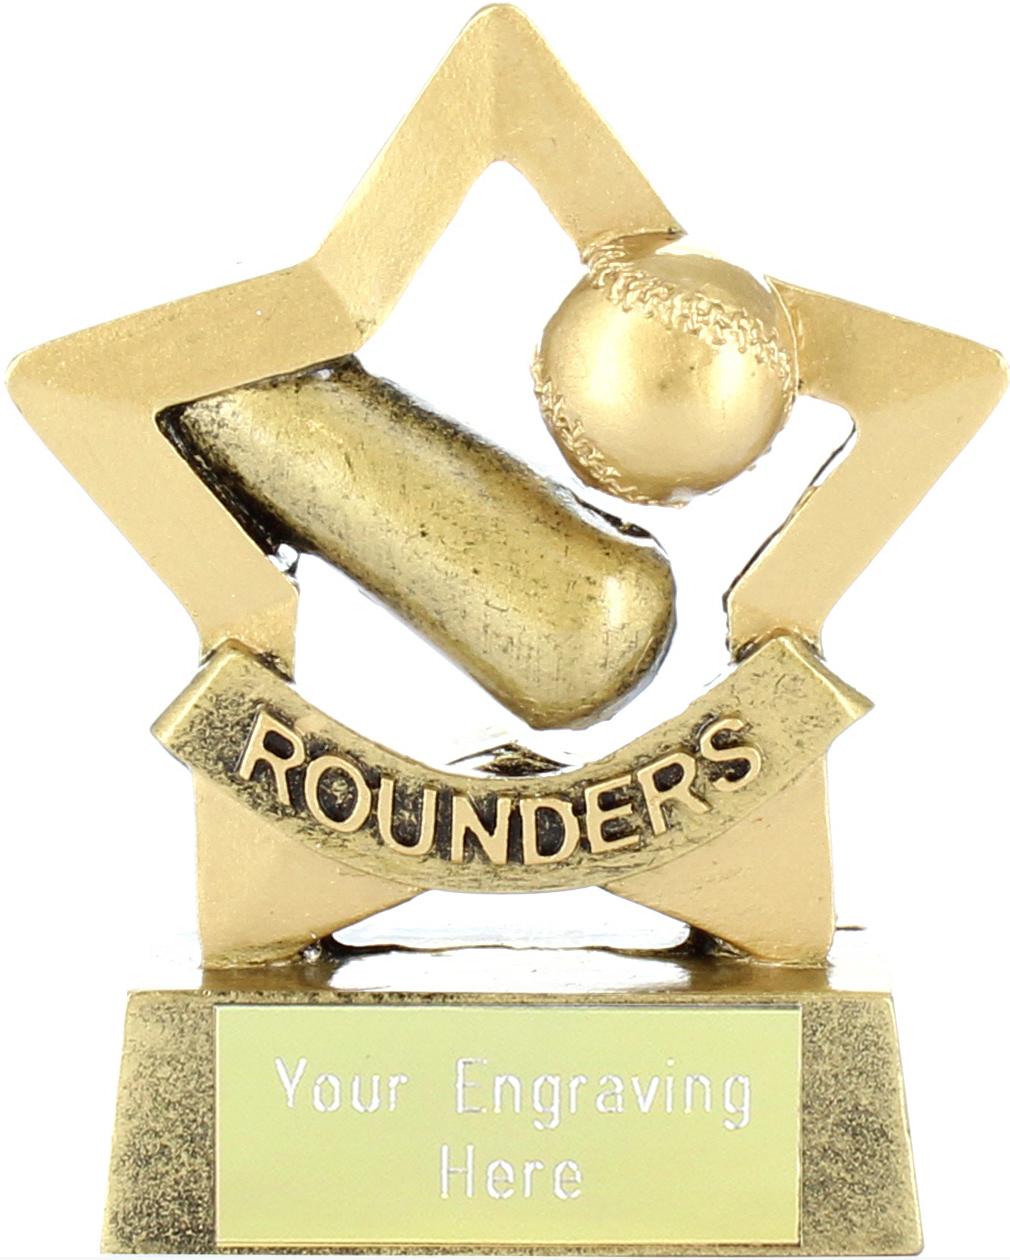 "Mini Stars Rounder's Award Trophy 8.5cm (3.25"")"